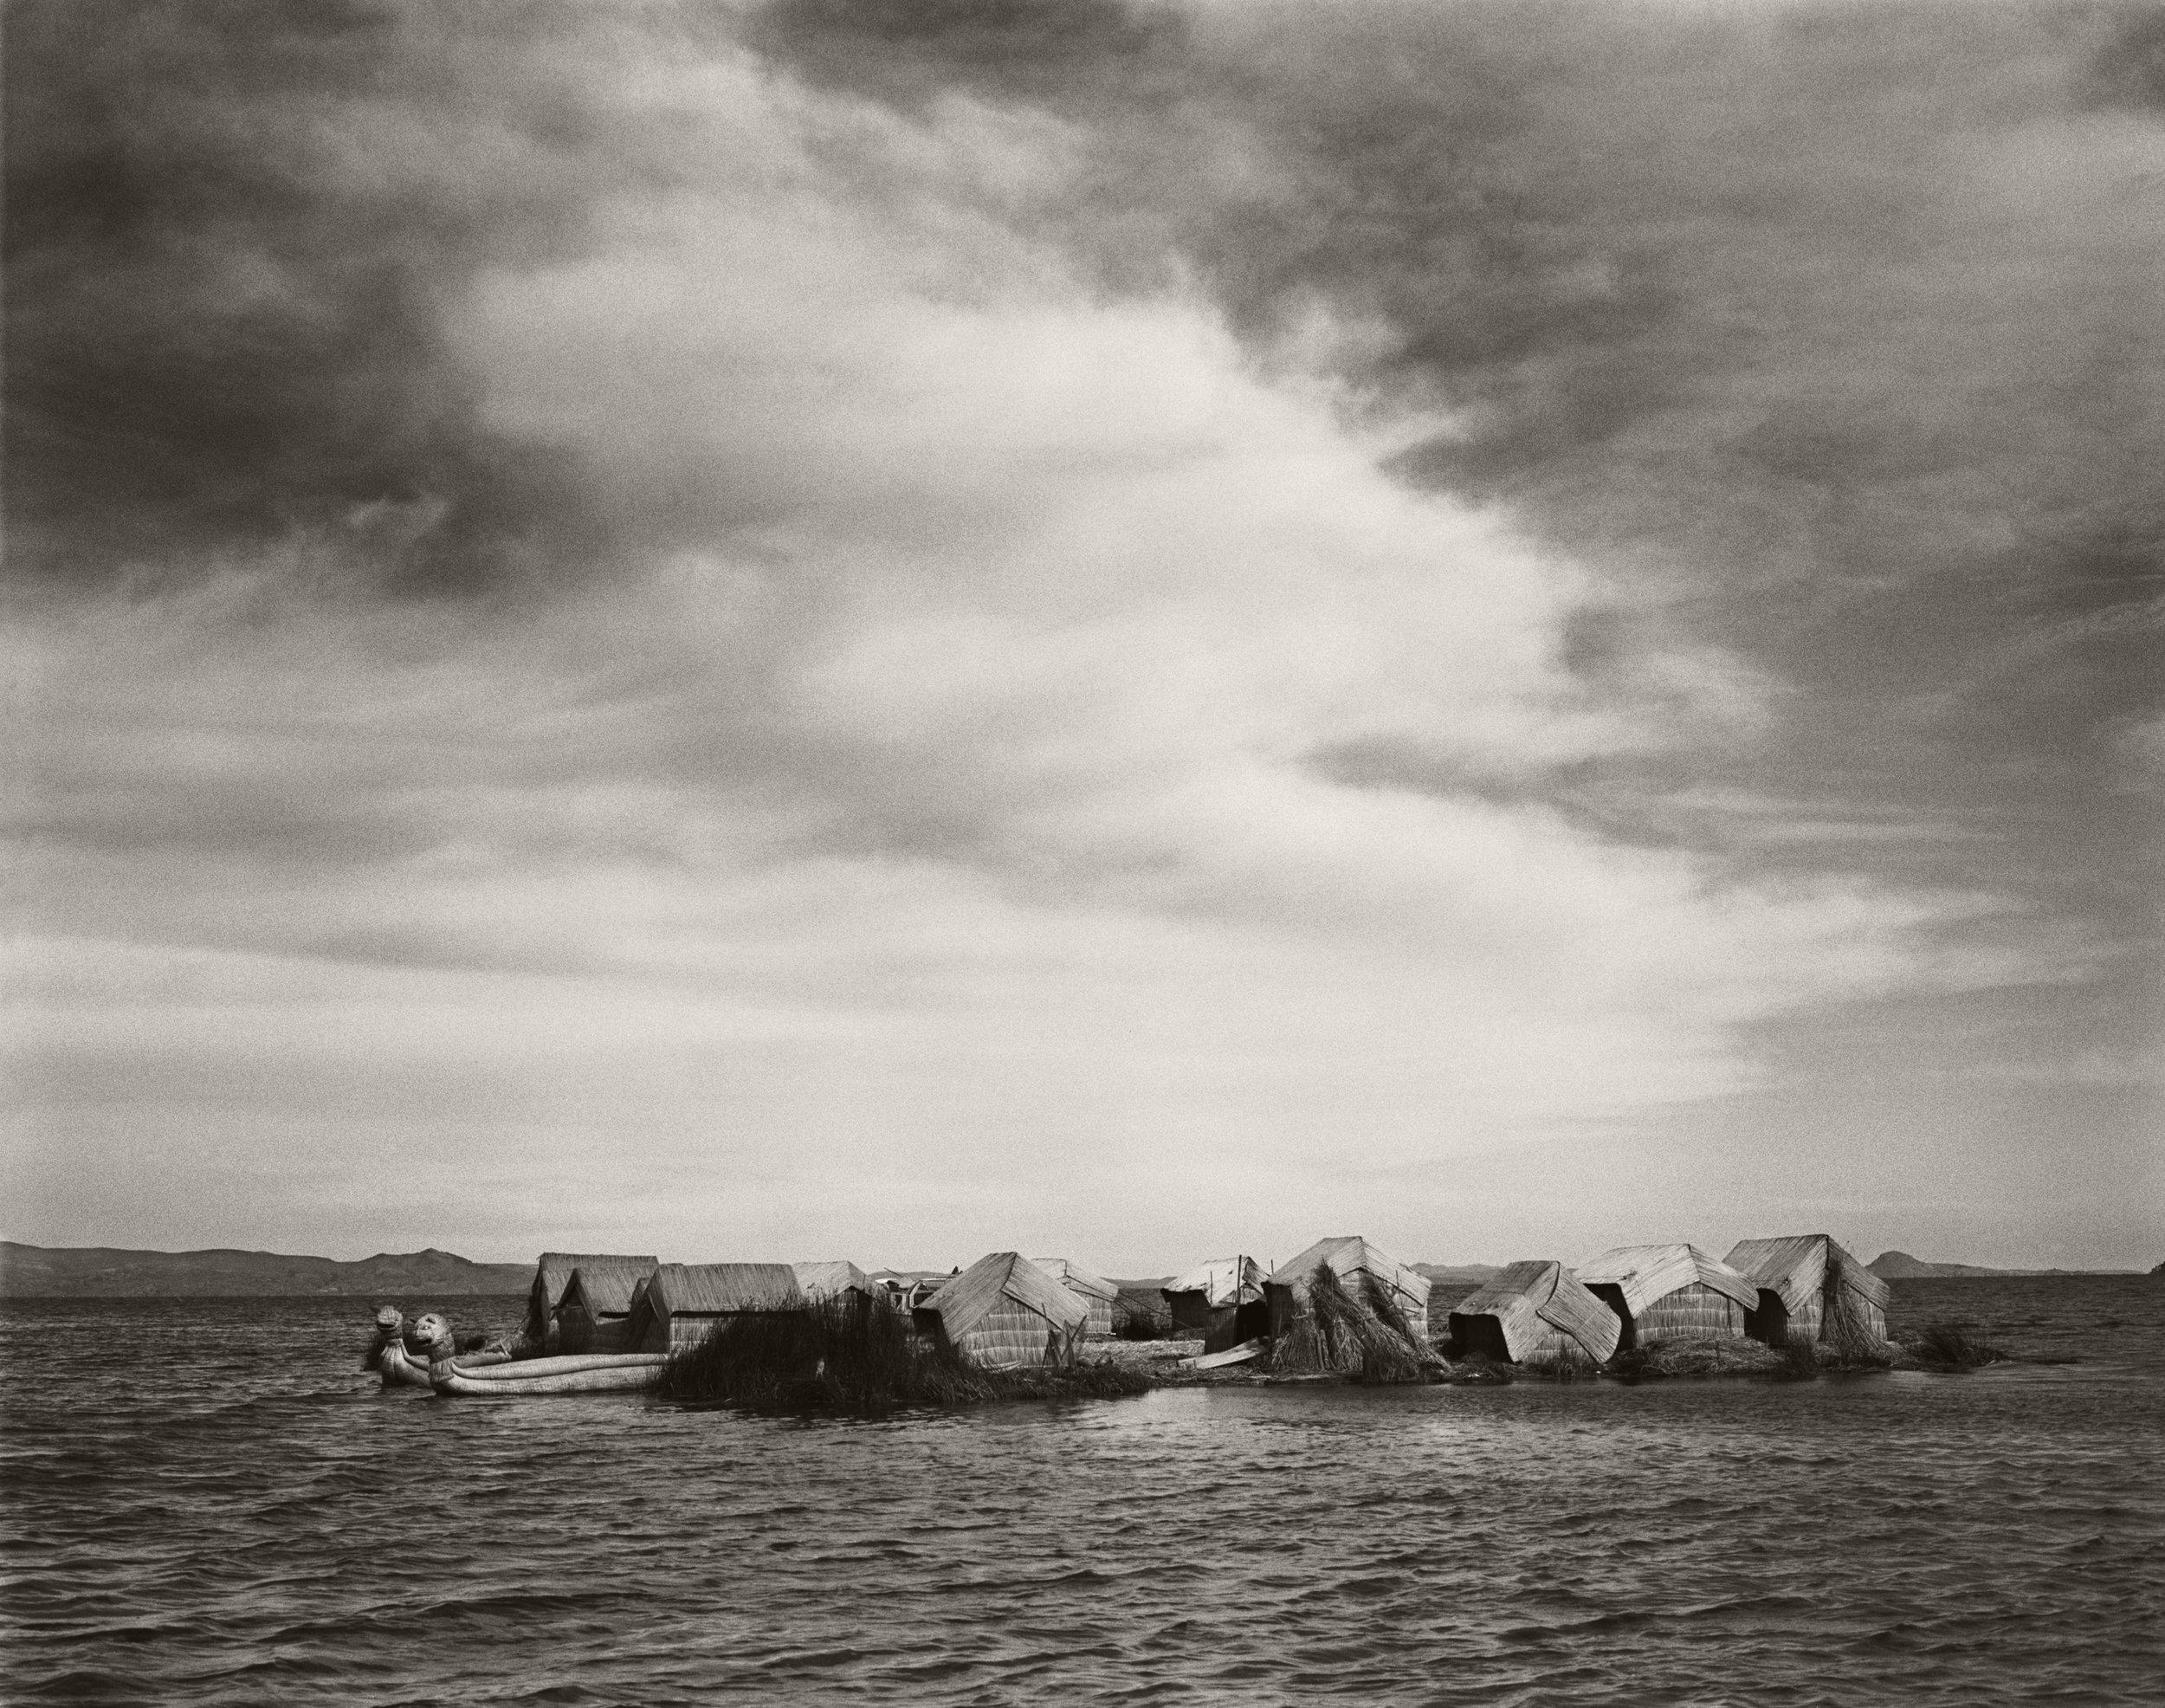 FLOATING UROS ISLANDS